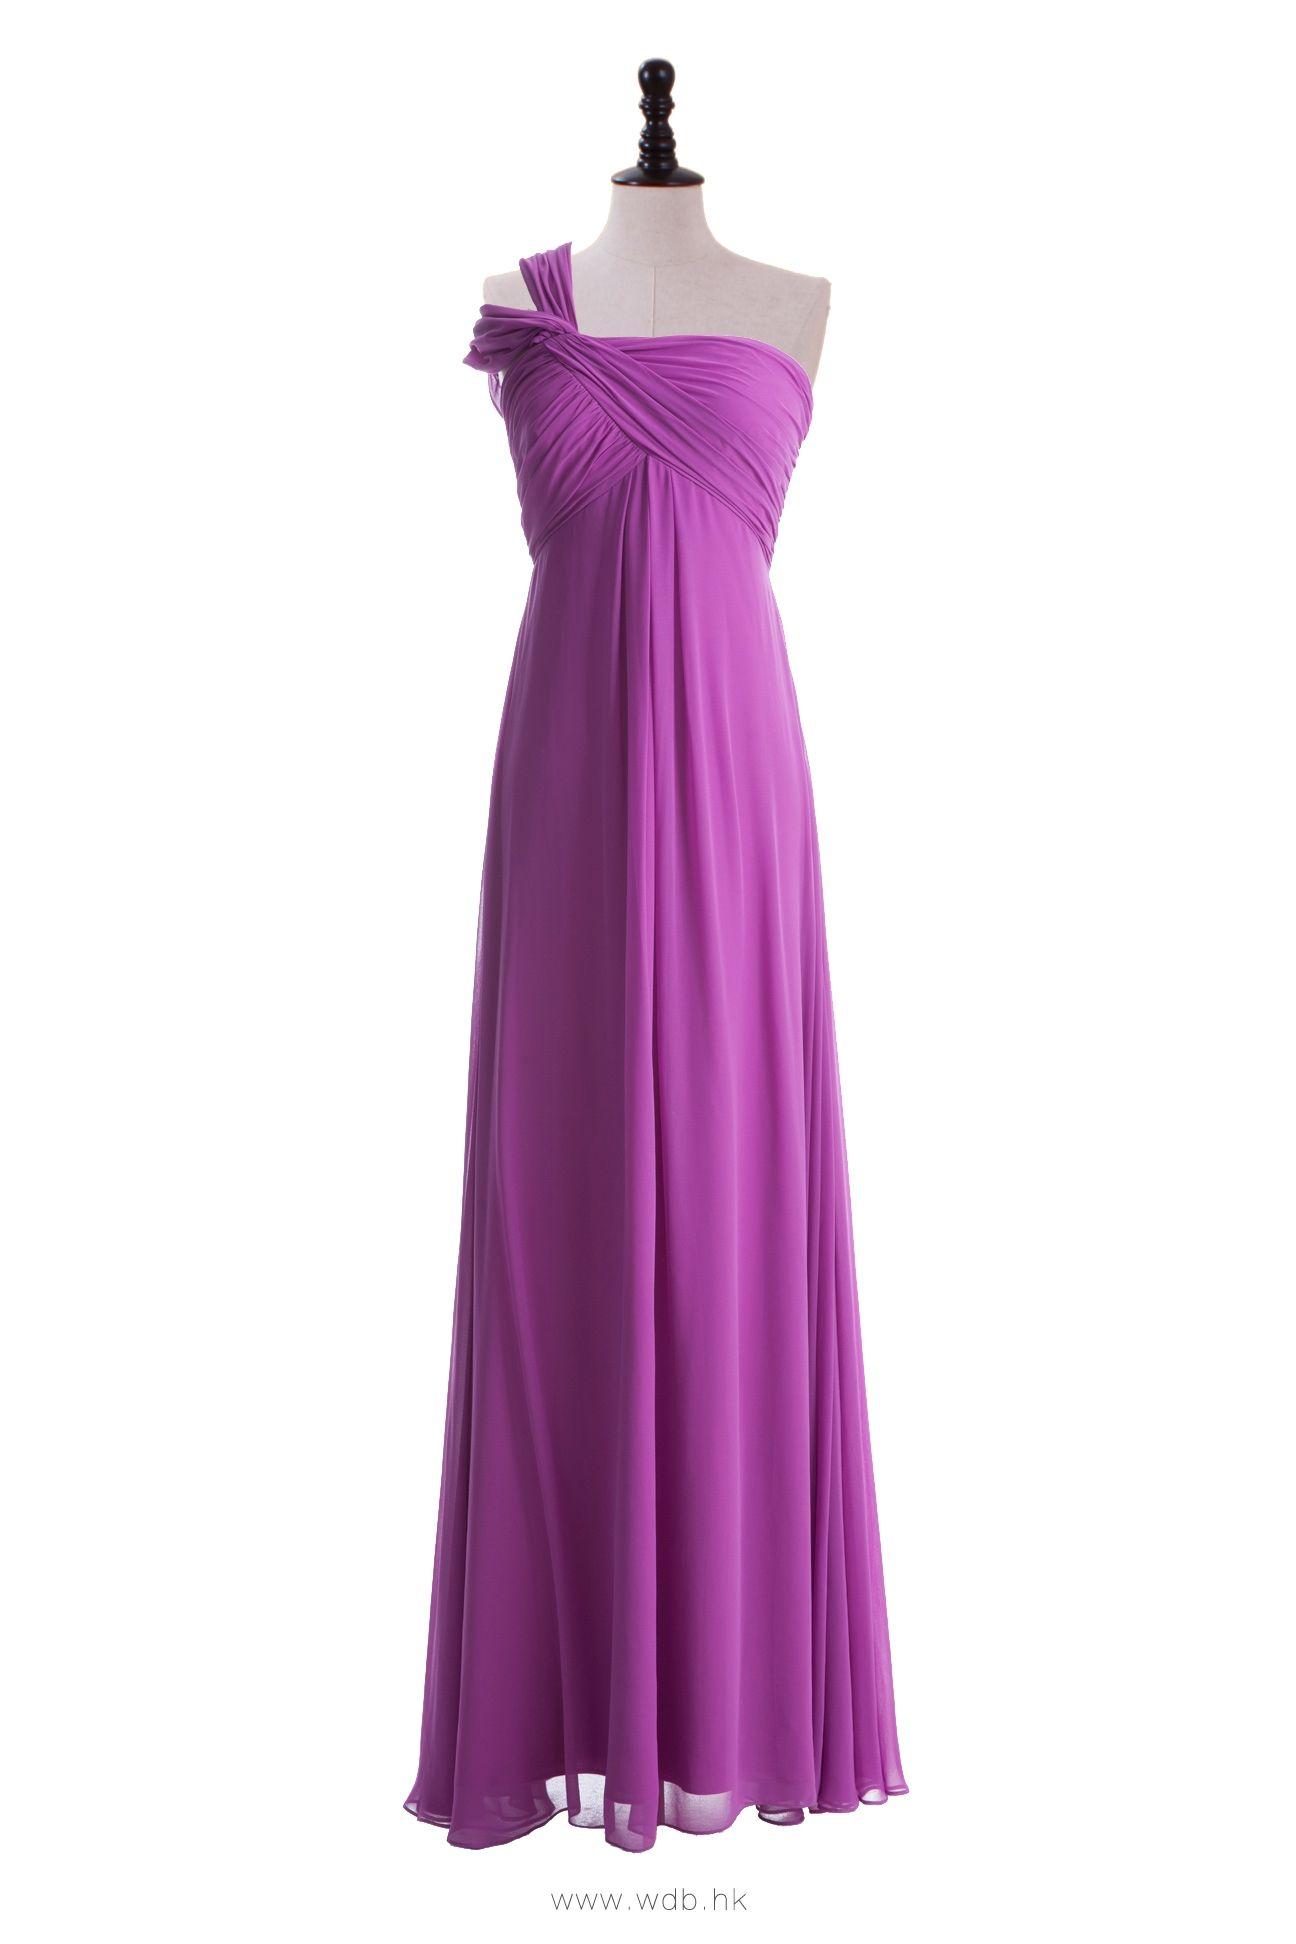 One Shoulder Empire Chiffon Dress $124.98 | Bridesmaids | Pinterest ...